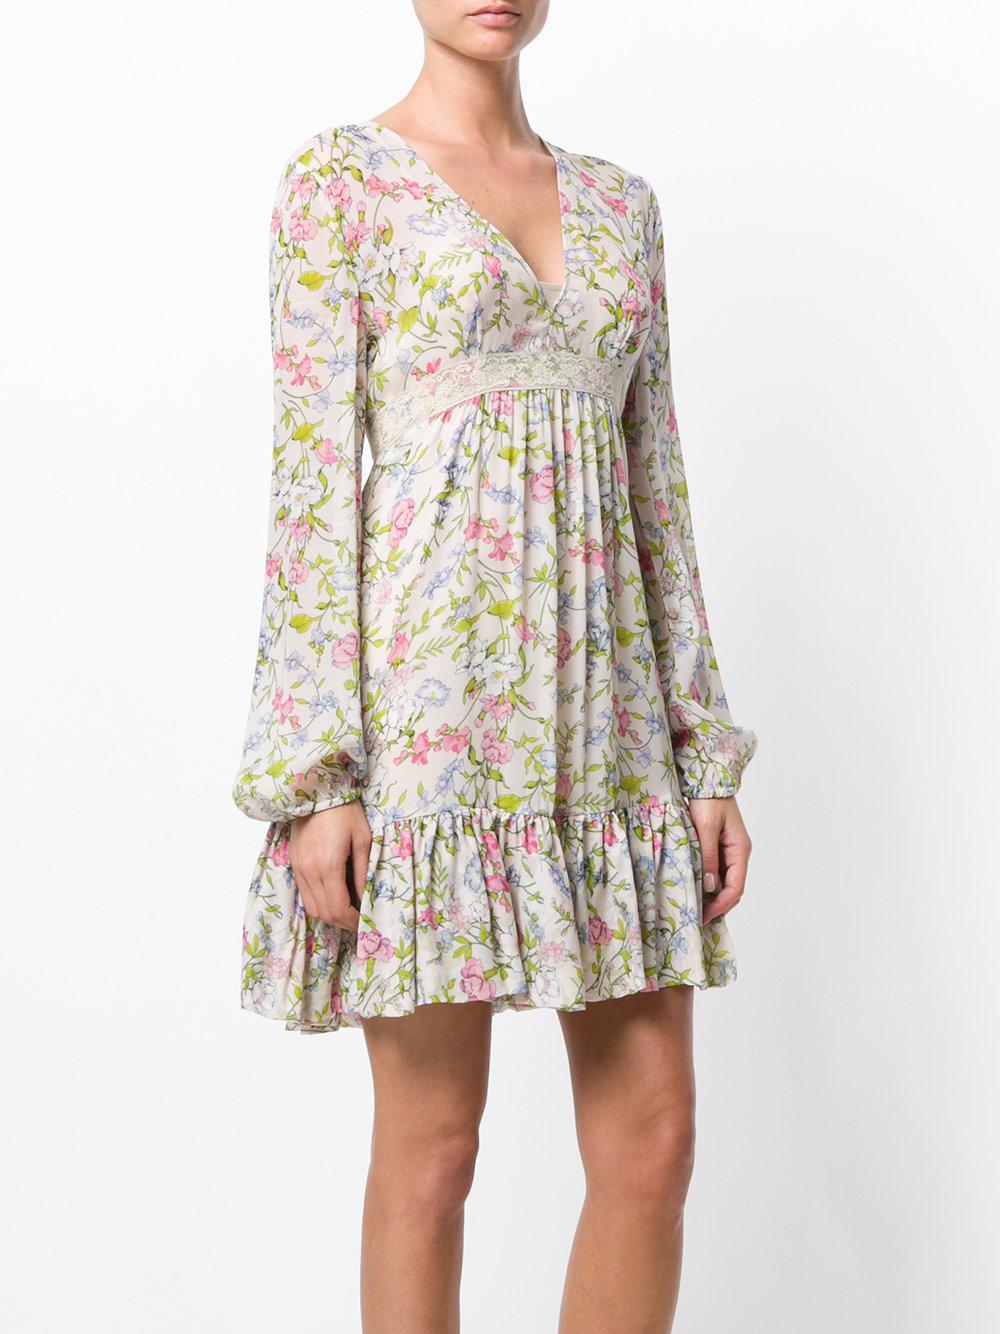 floral flared dress - Nude & Neutrals Twin-Set Amazing Price Cheap Price Choice For Sale Discount Shop Wholesale Online 2urfXYXuj1